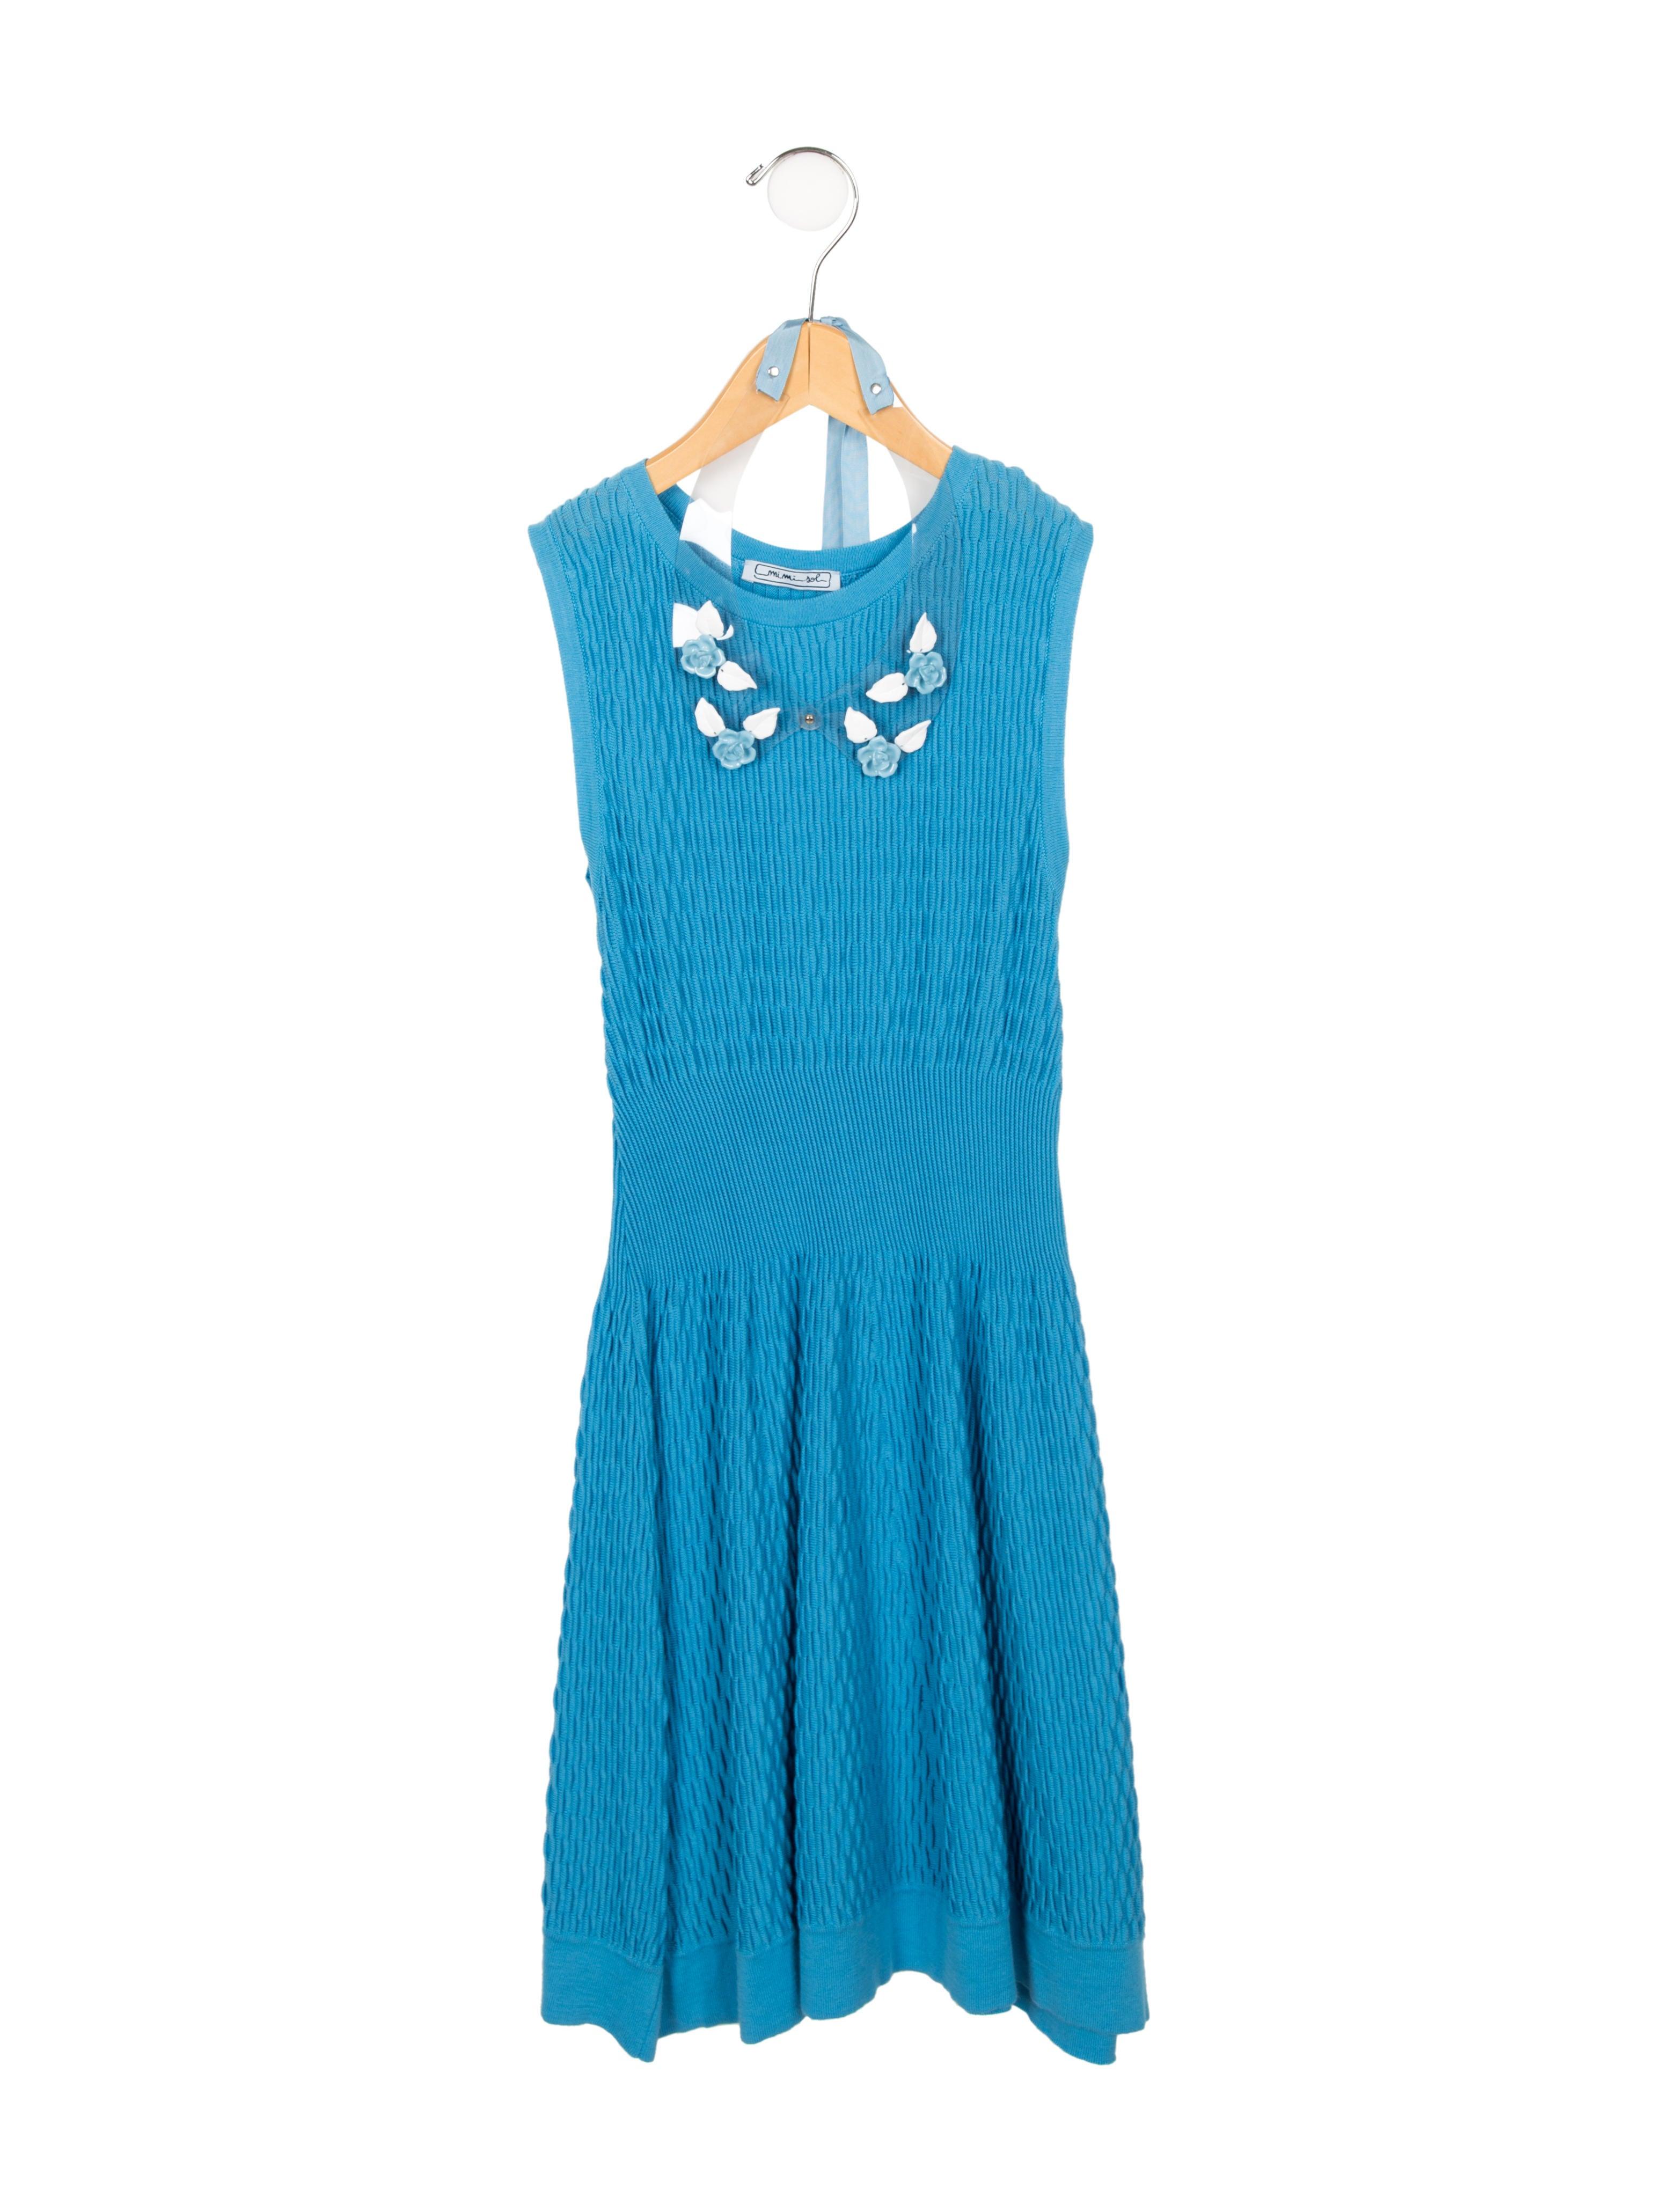 Knitting Dress For Girl : Mimi so girls rib knit dress mim the